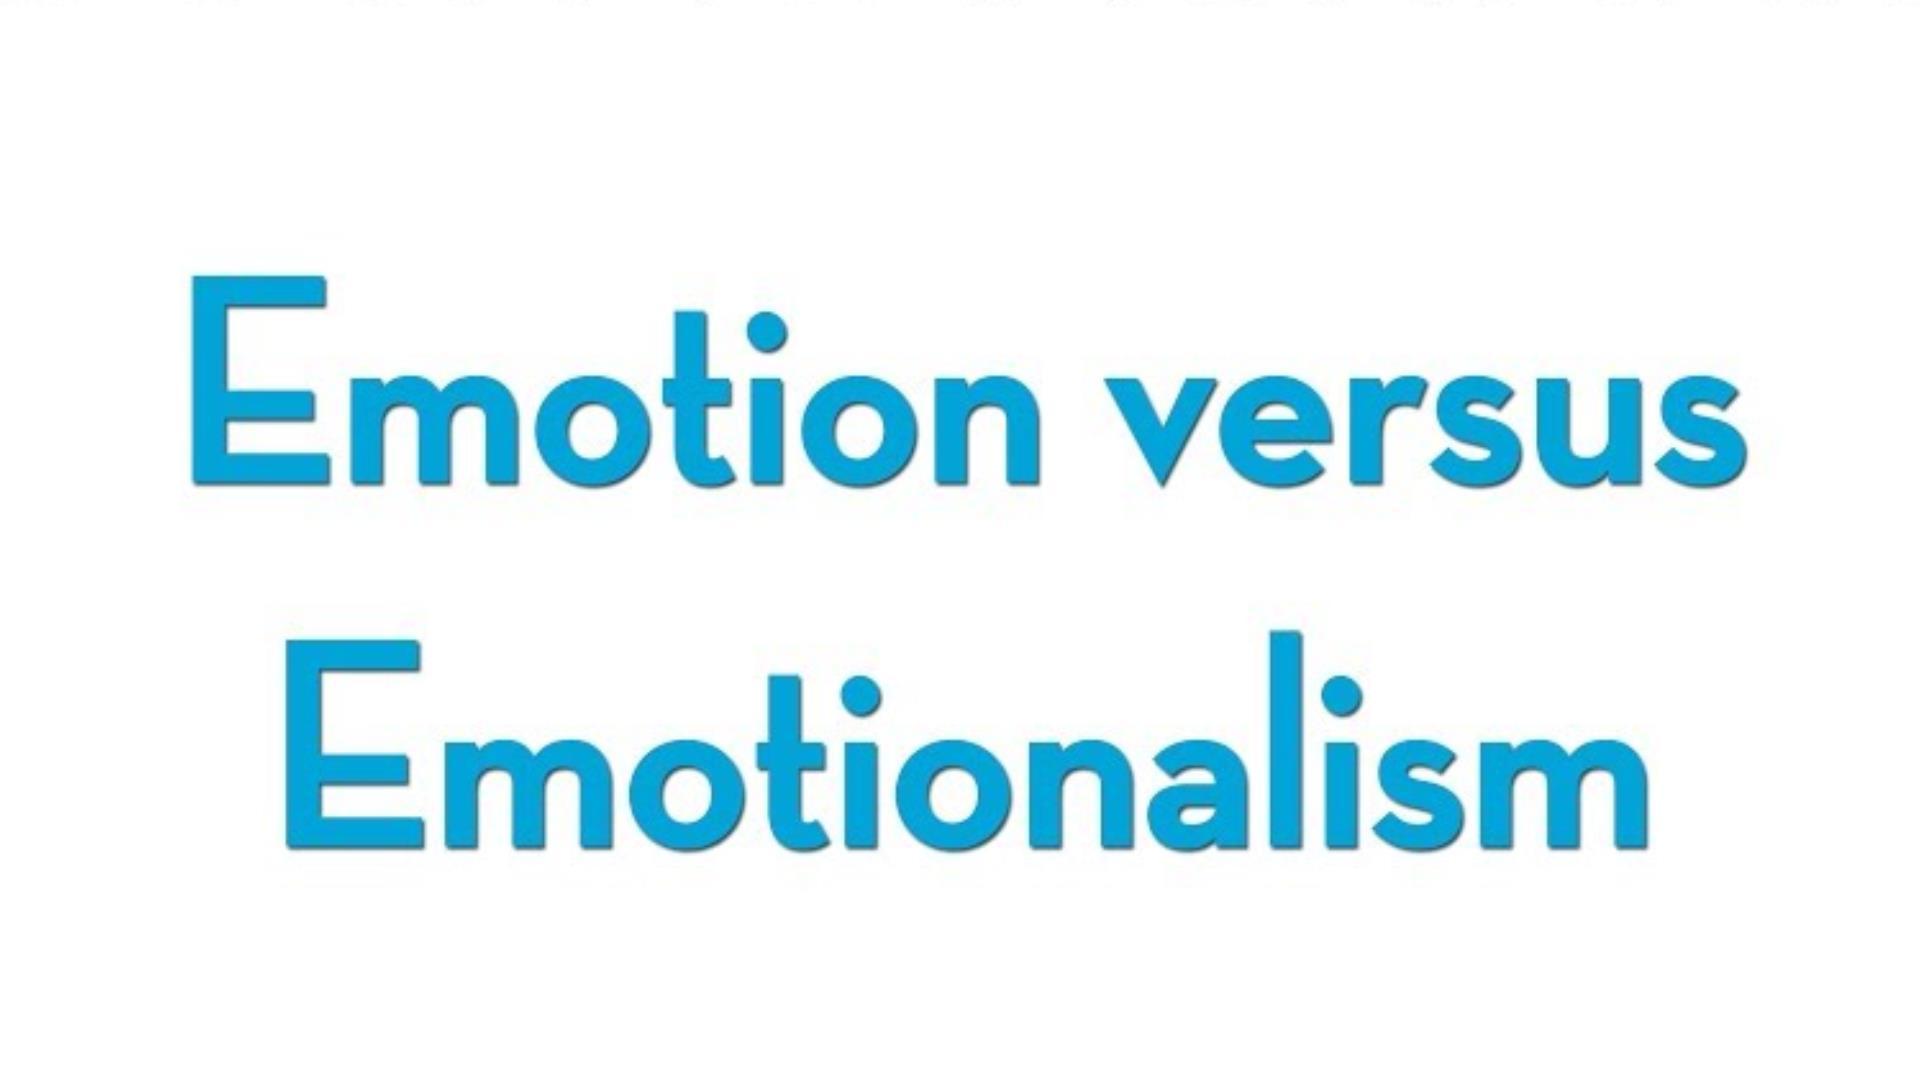 Emotion vs. Emotionalism